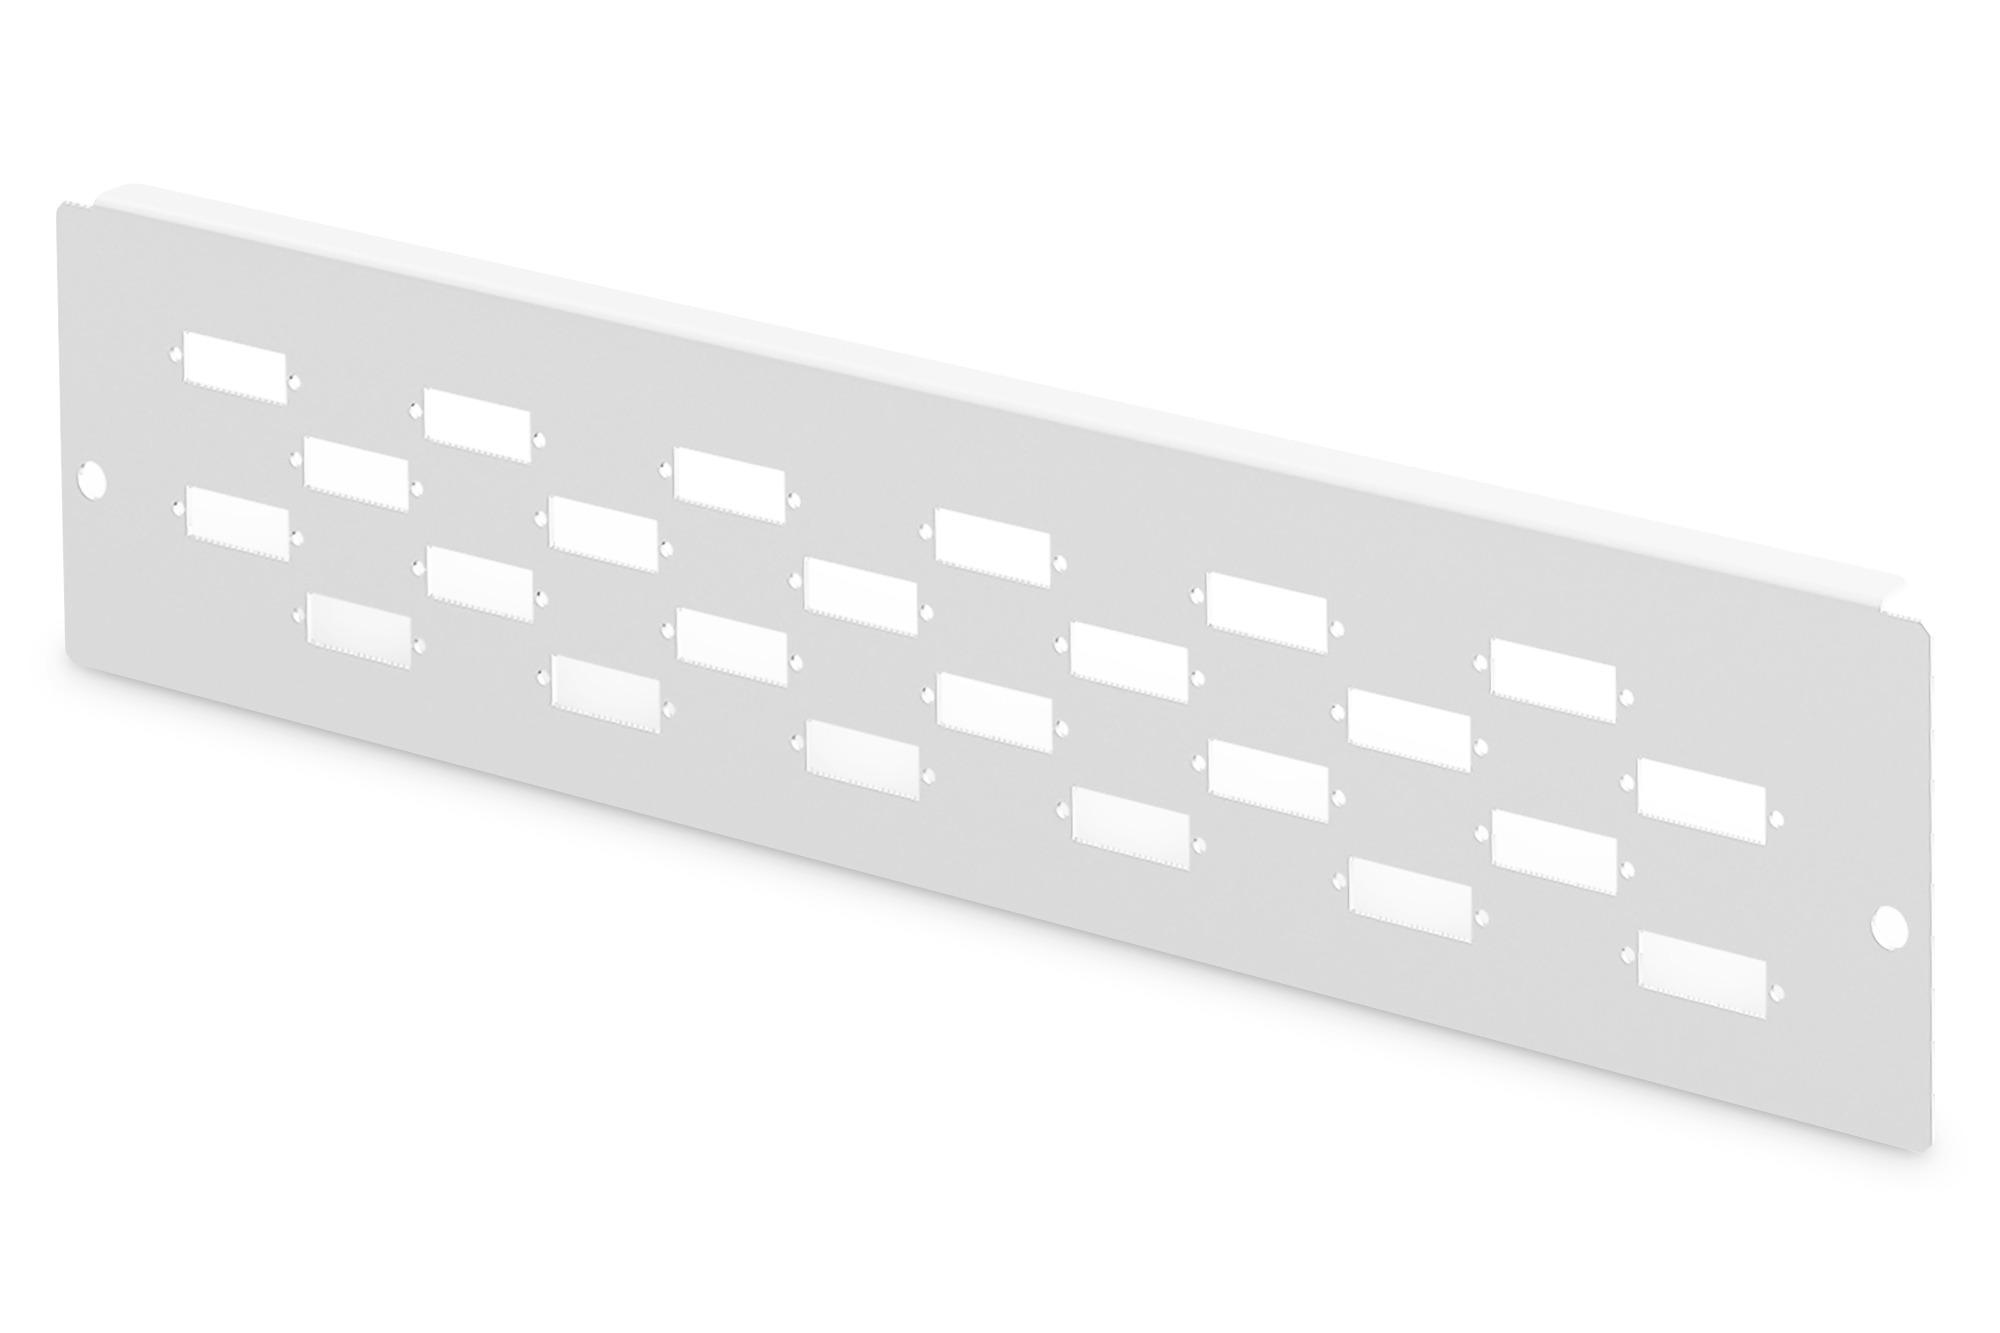 Piastra adattatore per dn-96800m-2, grigio (ral 7035) 12x sc-dx, lc-qd